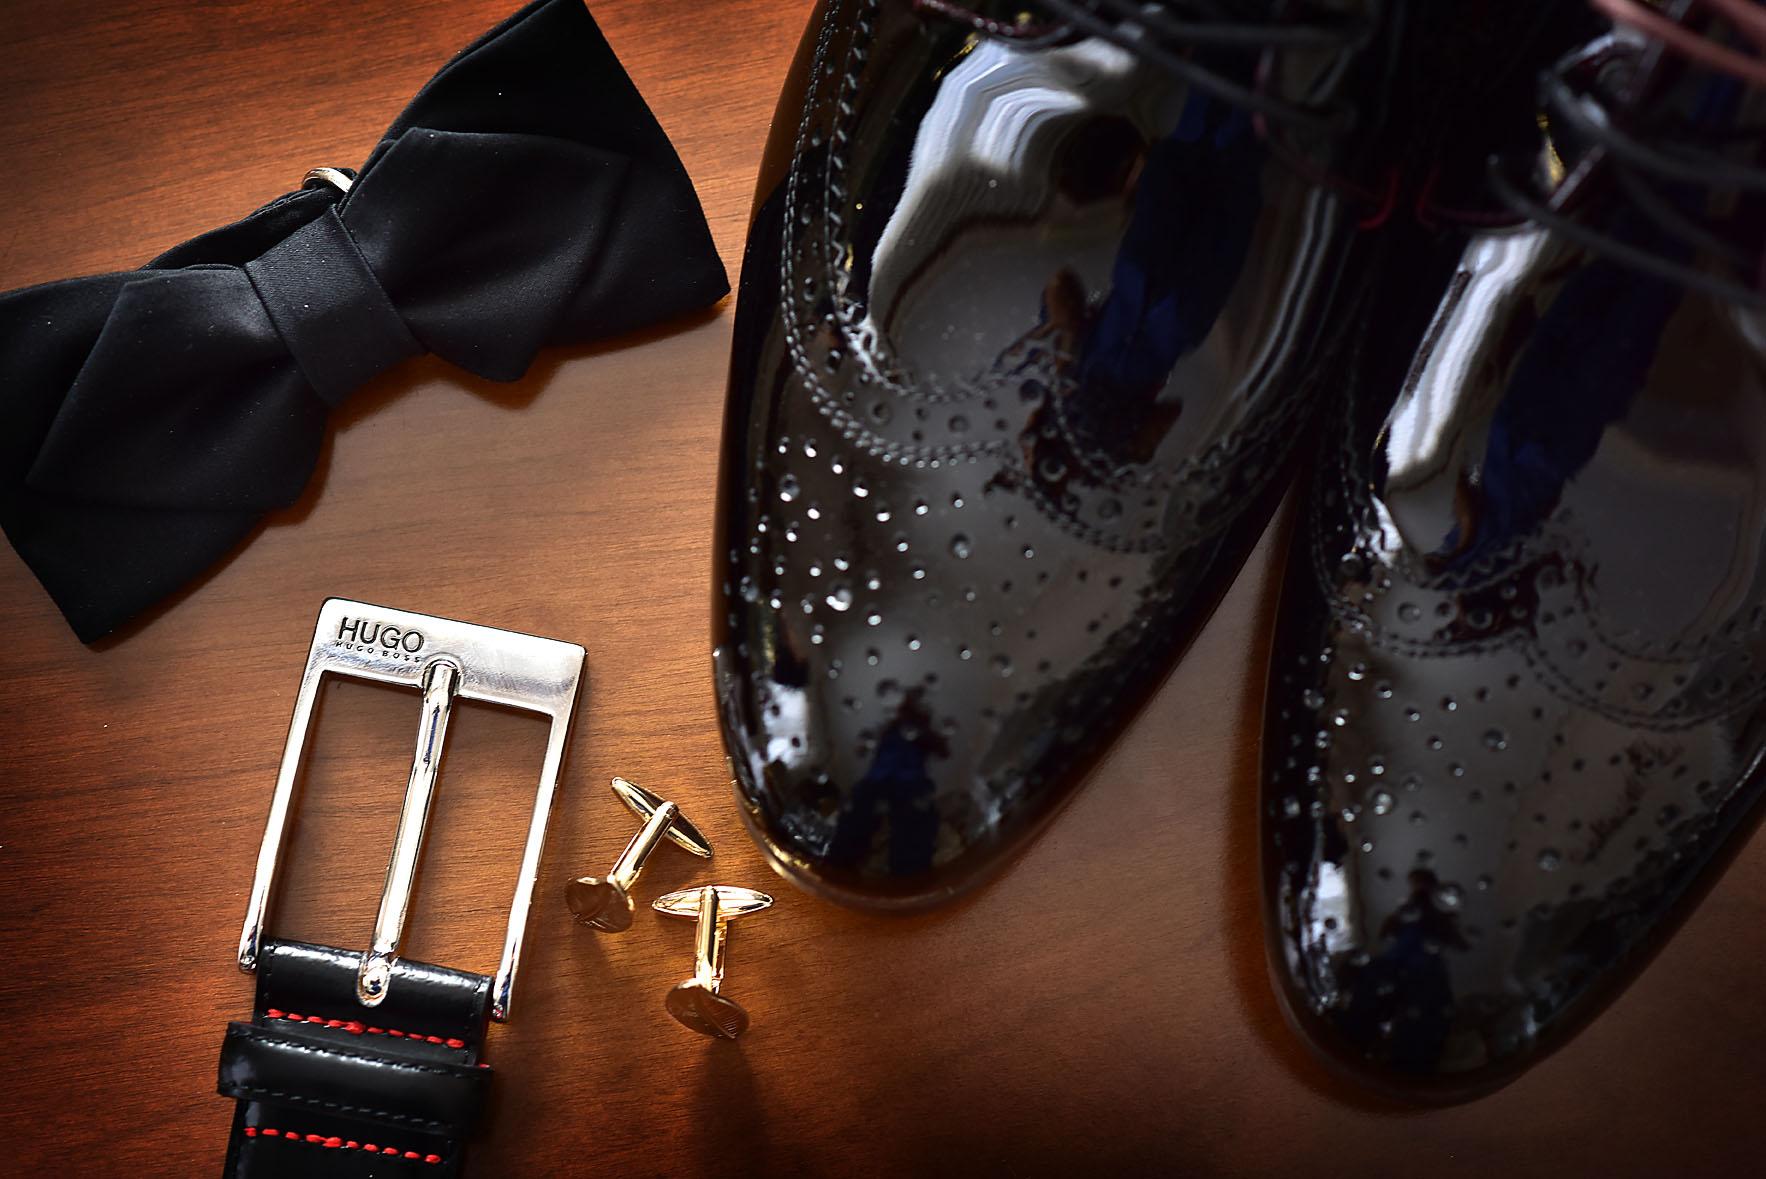 groom-shoes-preparation-son-father-wedding-dress-larissa-alexis-koumaditis-photography